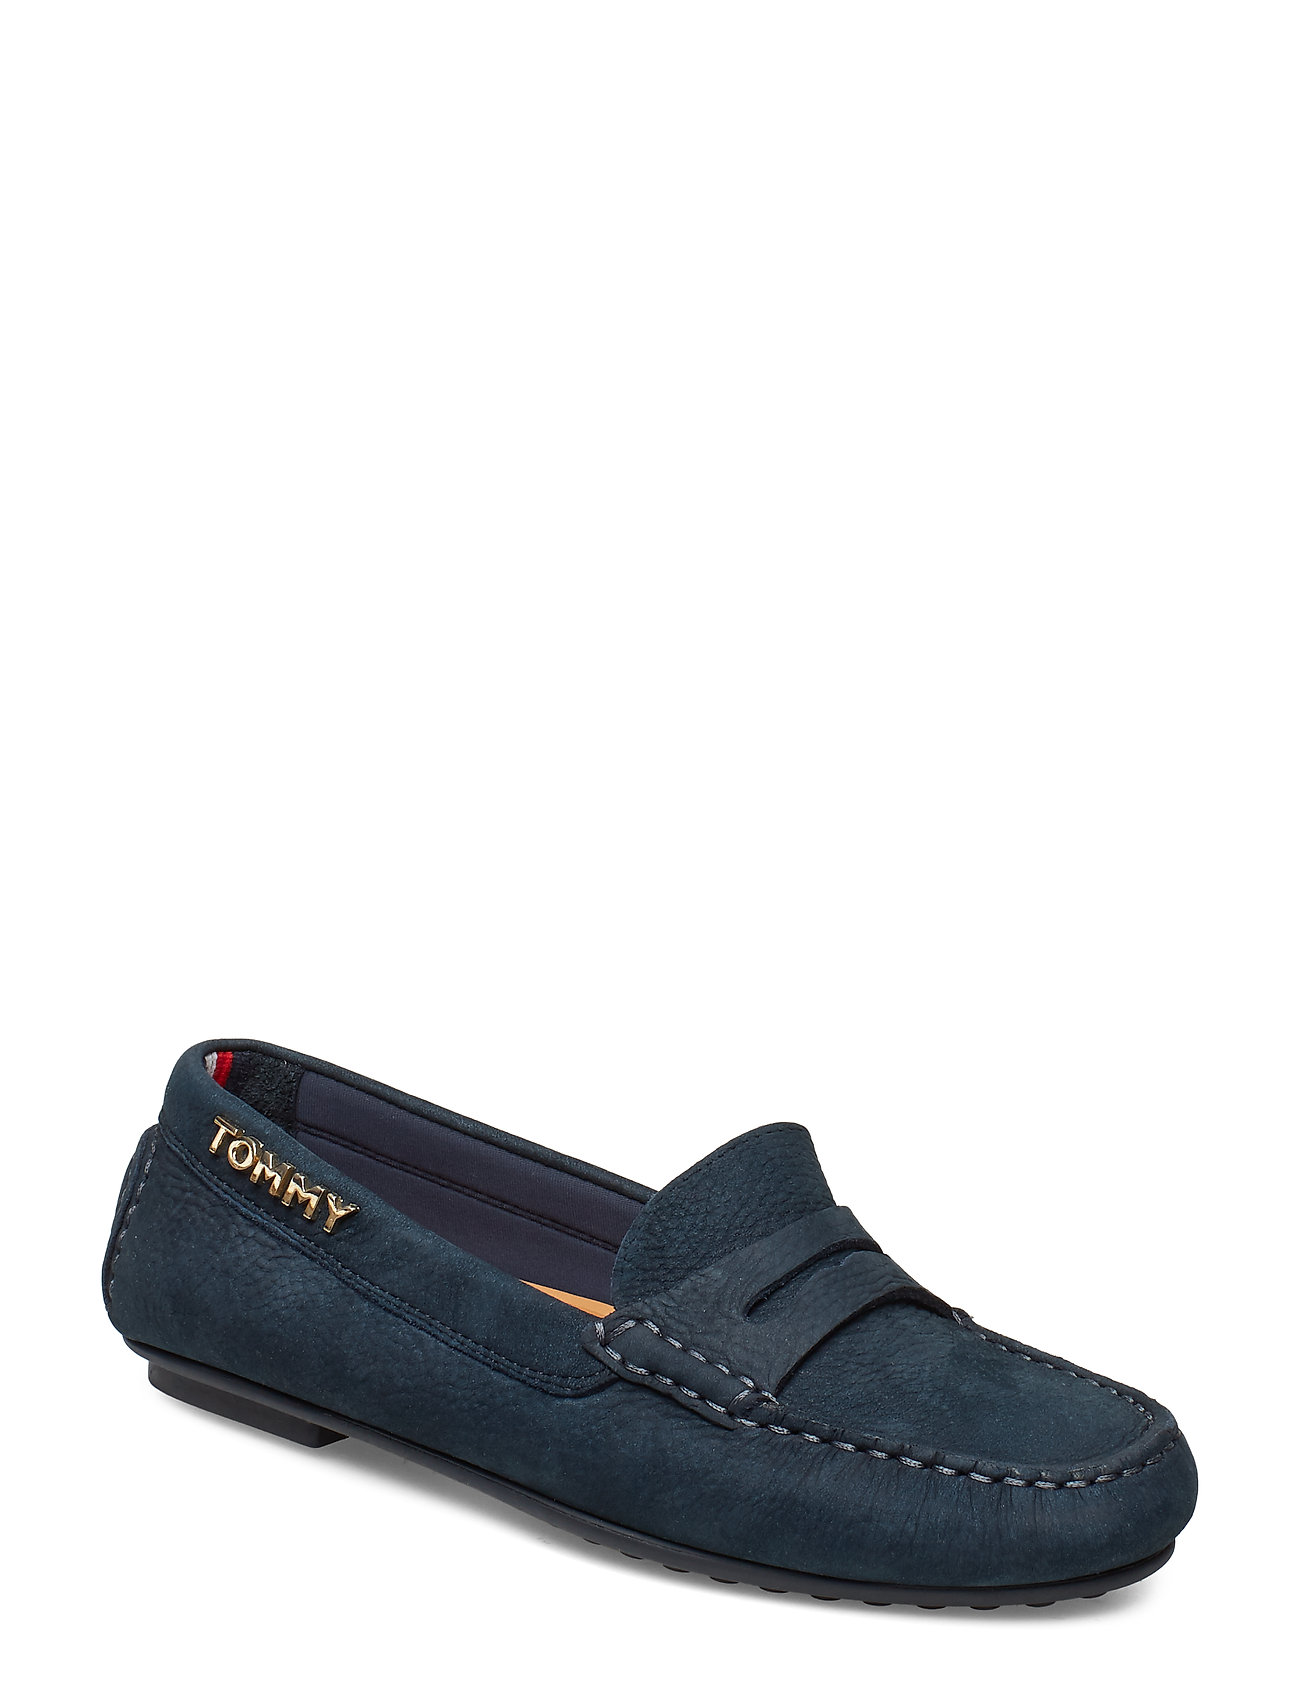 TOMMY HILFIGER Negin 3n Loafers Flache Schuhe Blau TOMMY HILFIGER